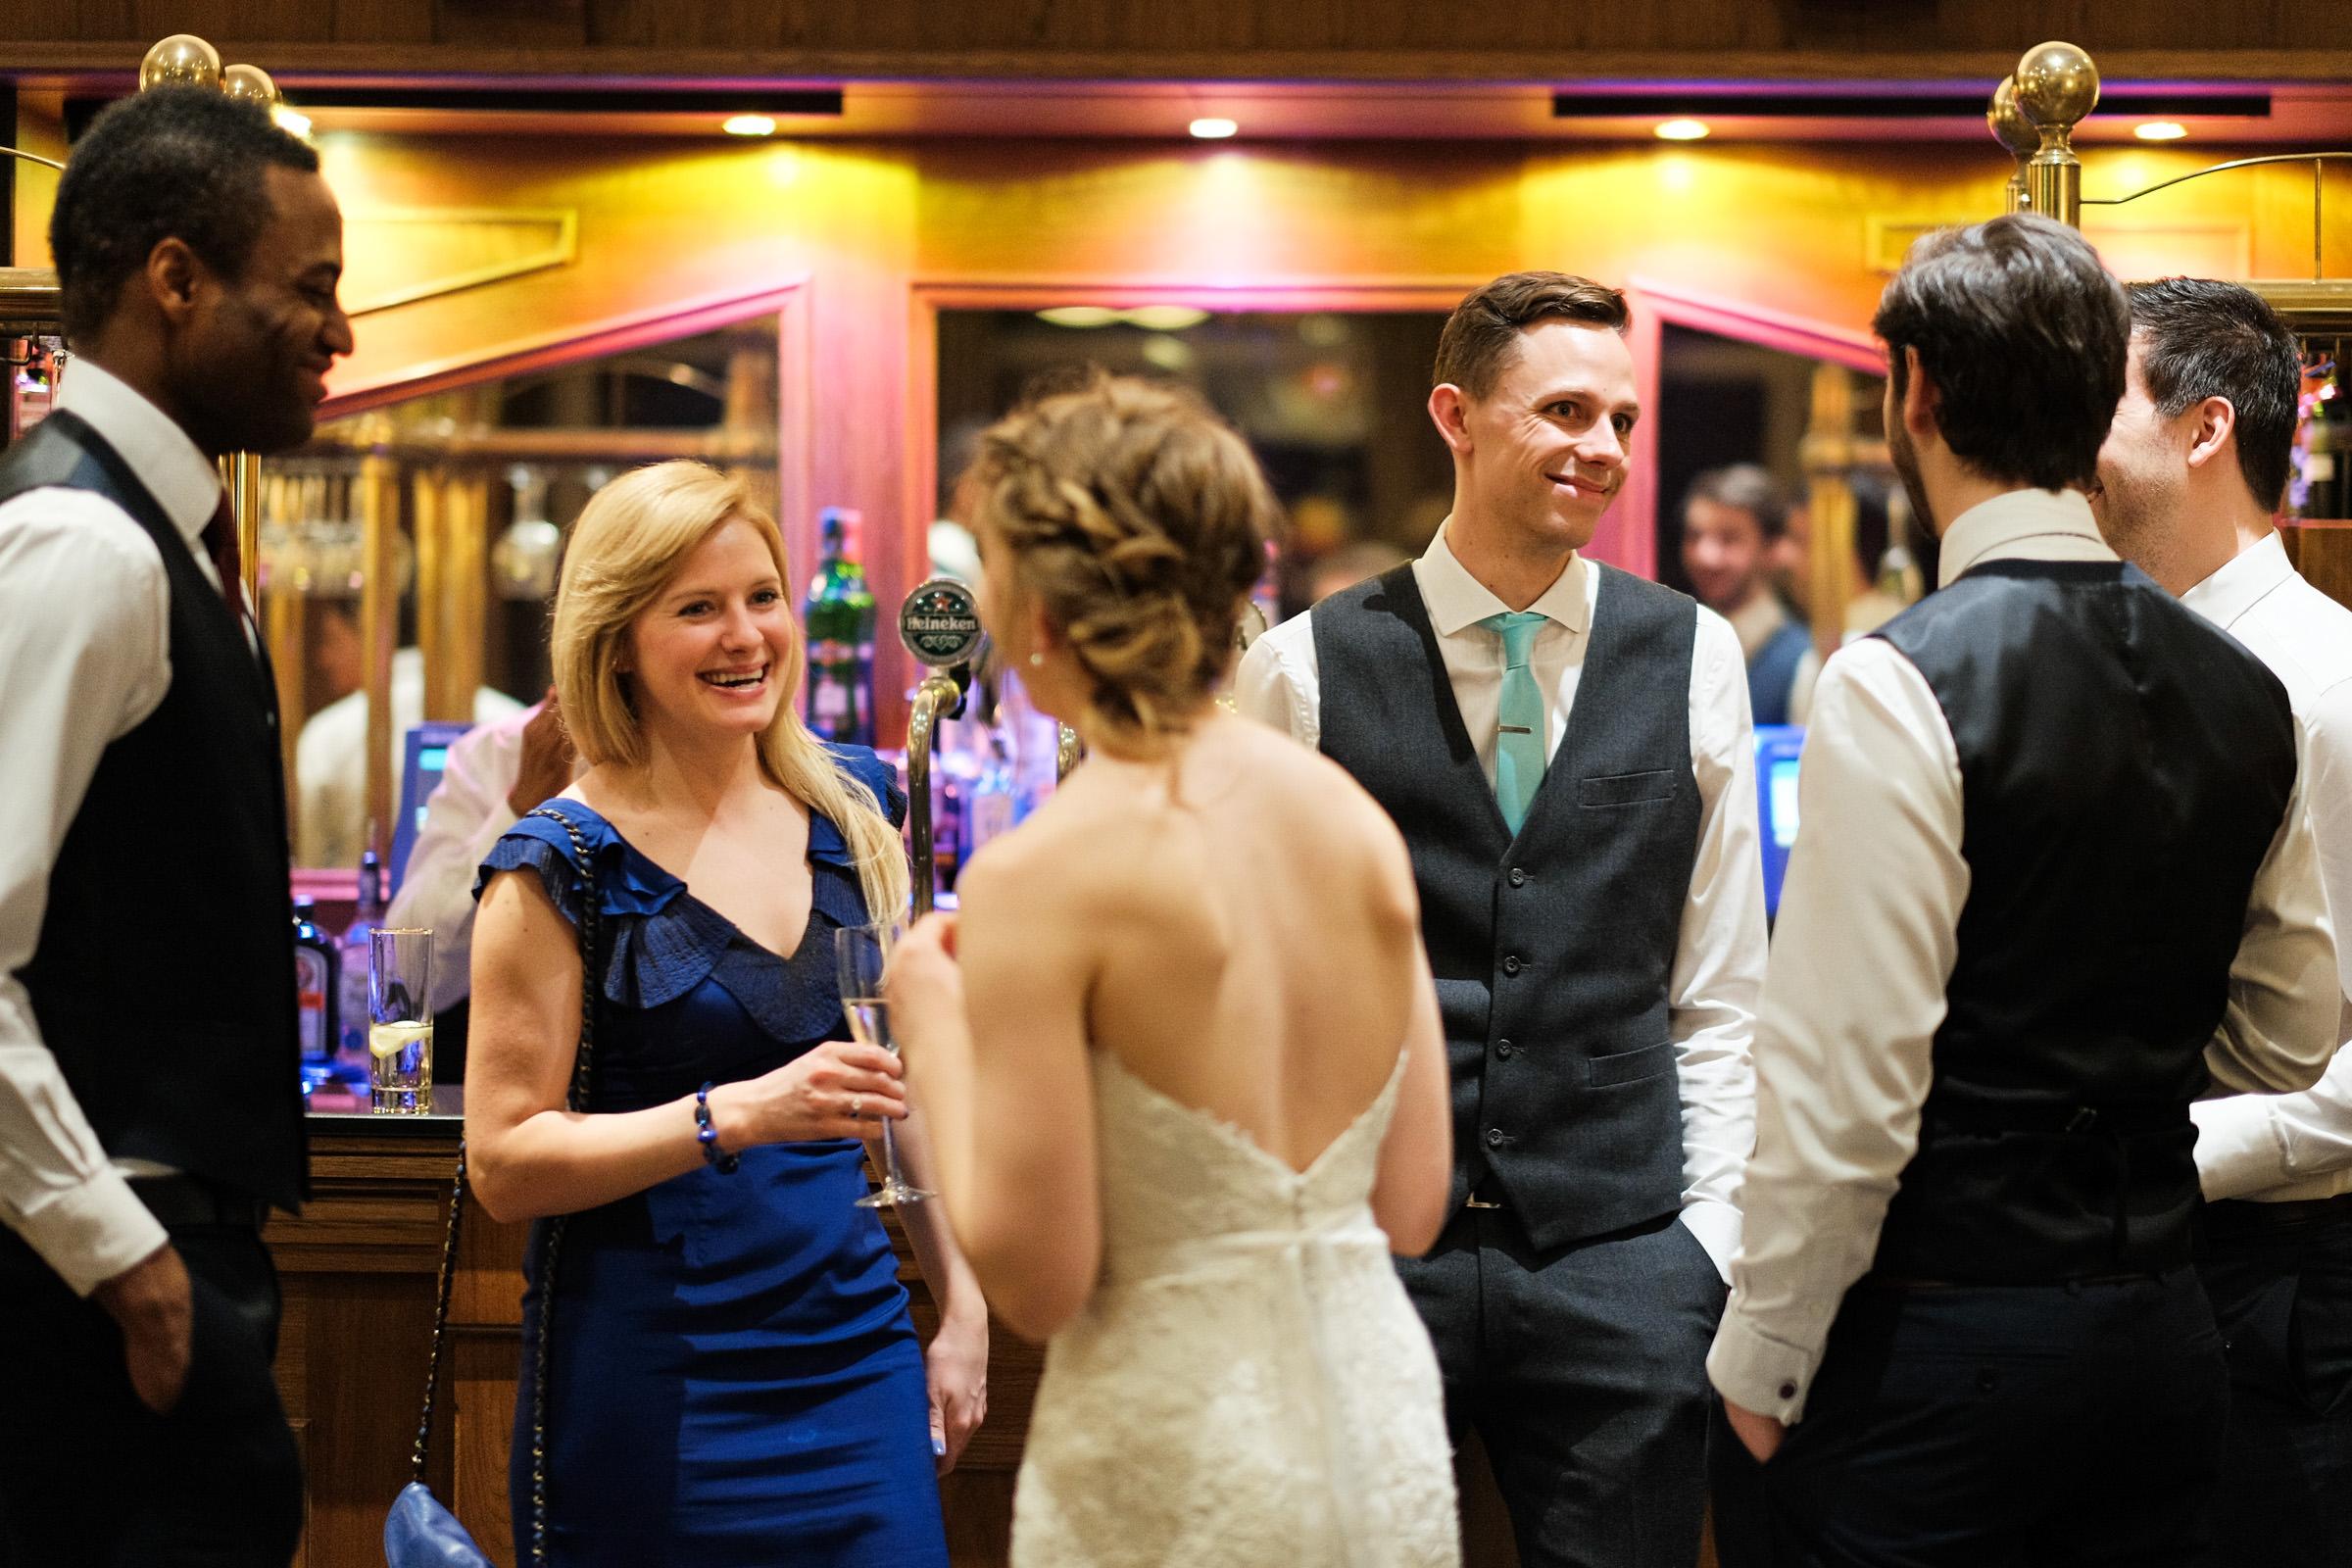 Wedding at Royal Holloway University in Surrey 022.jpg